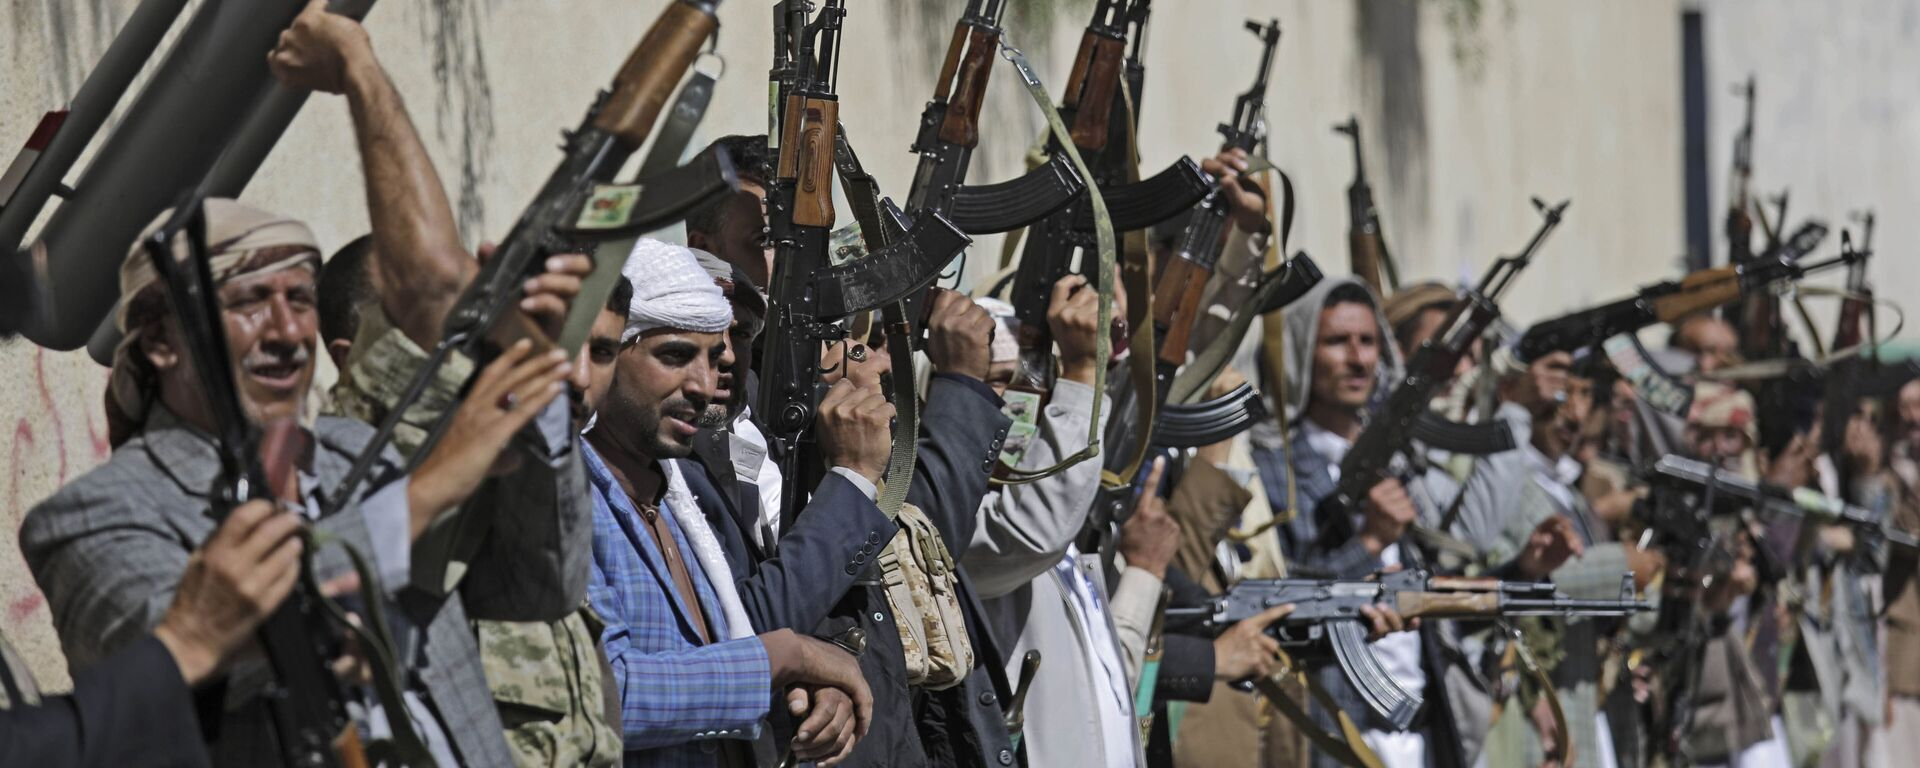 Tribù fedeli agli Houti in Yemen - Sputnik Italia, 1920, 09.05.2021